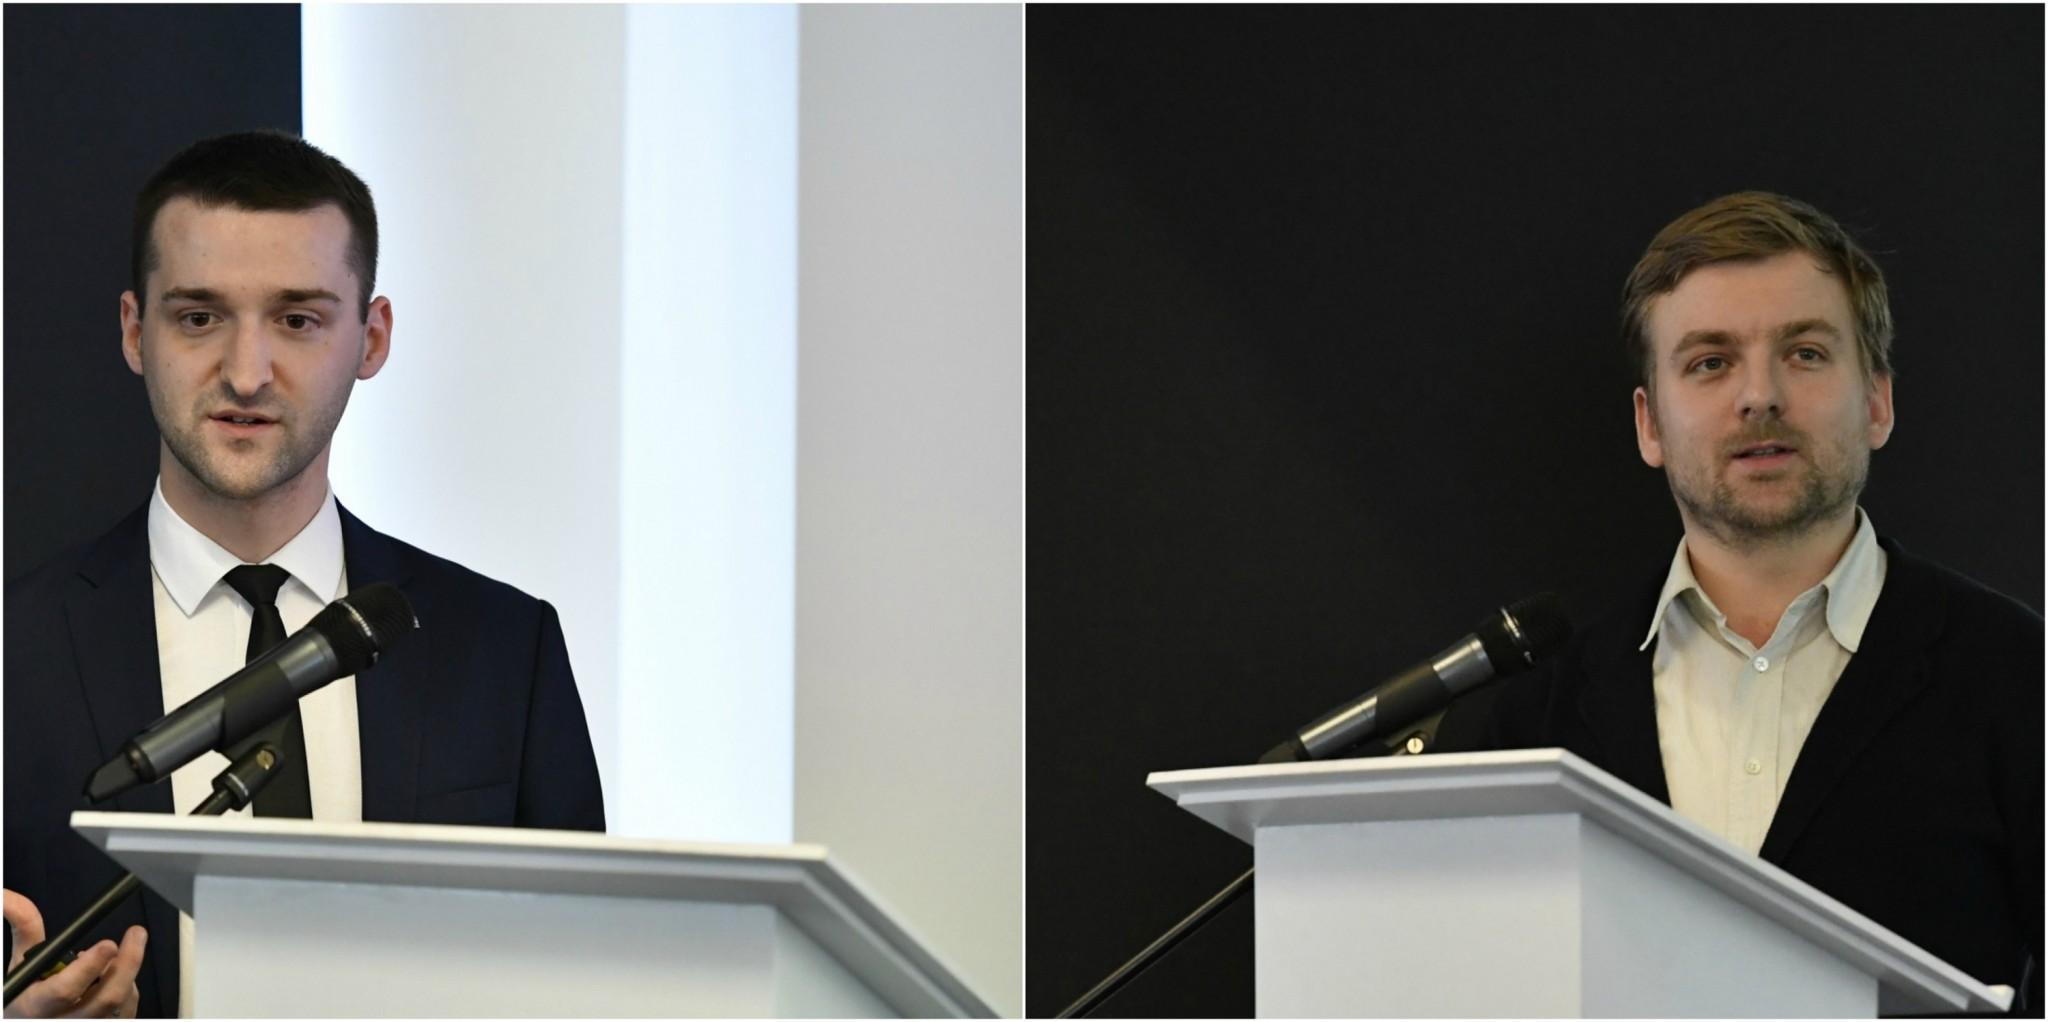 Maxim Simonov and Dmitry Schwartz deliver speeches during the event. Photographs: Skoltech.